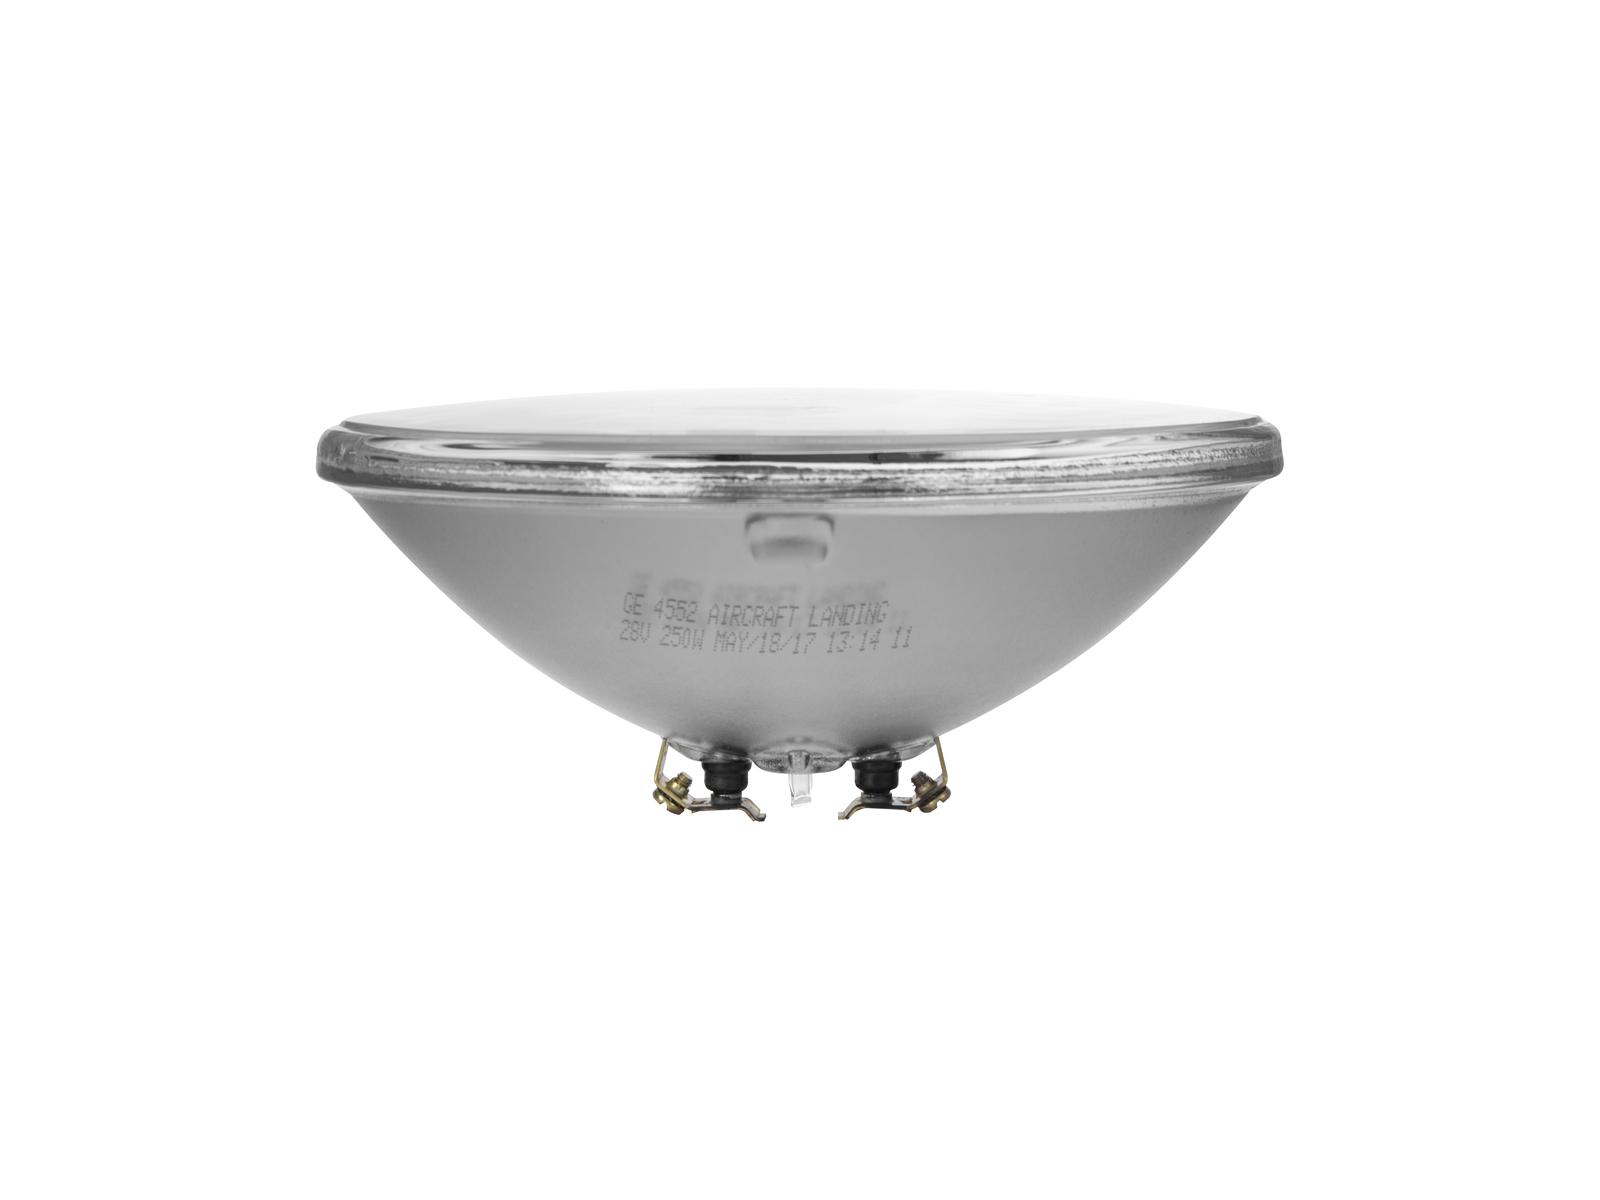 Lampada Faro GE 4552 PAR-64 28V/250W VNSP 25h Aerei